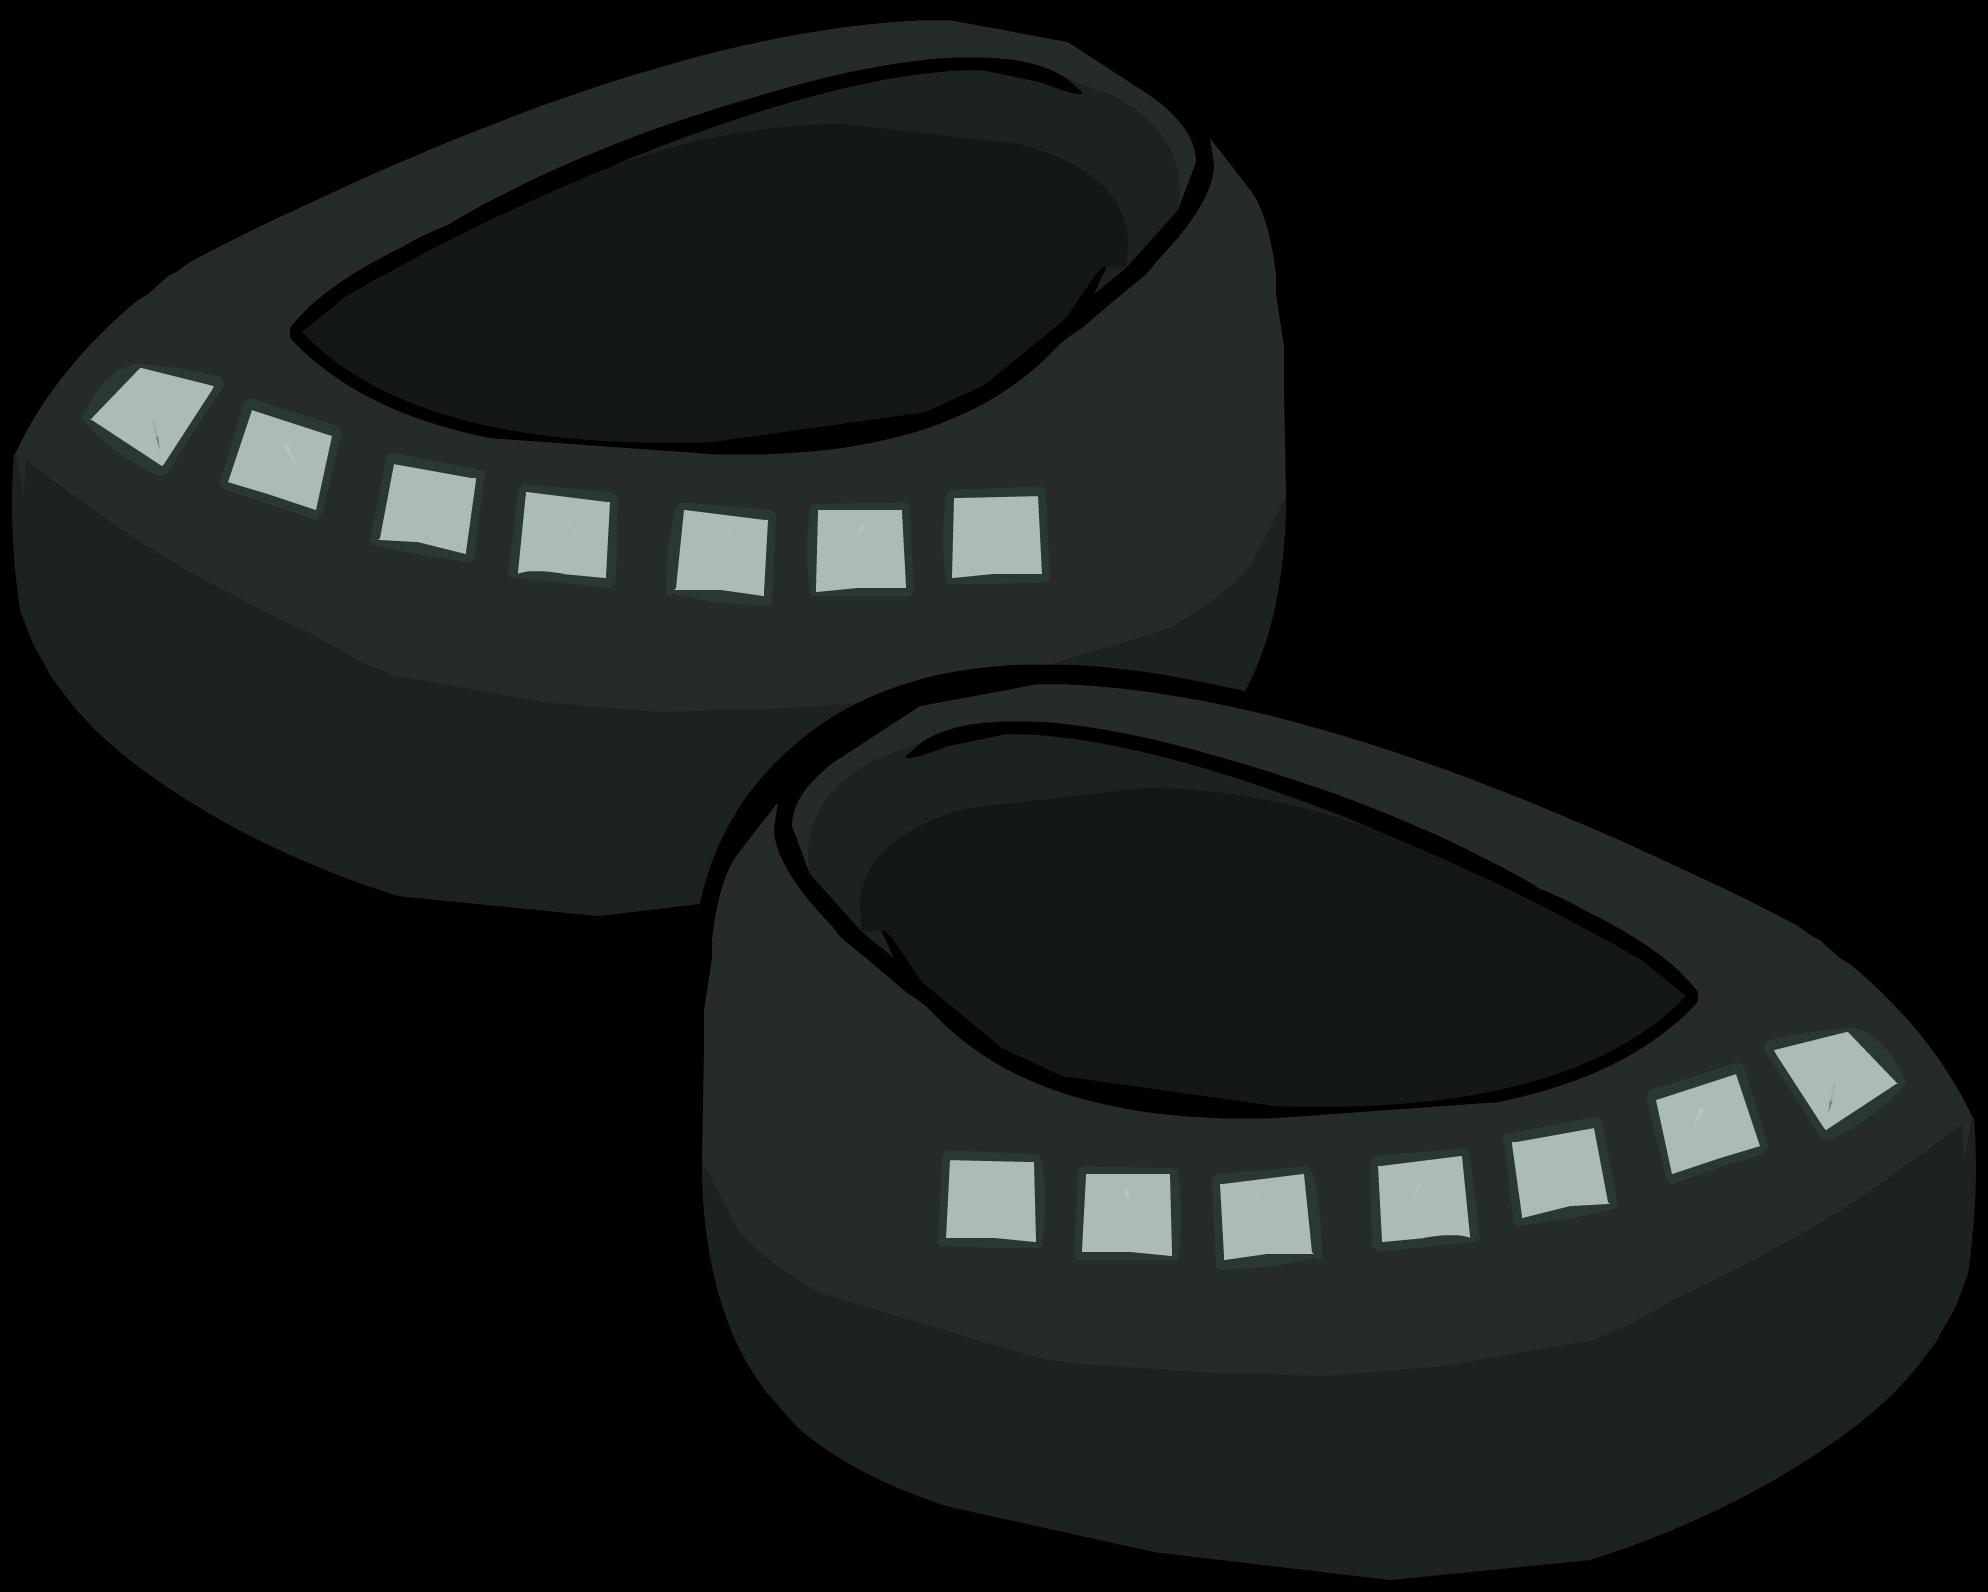 Black Studded Shoes